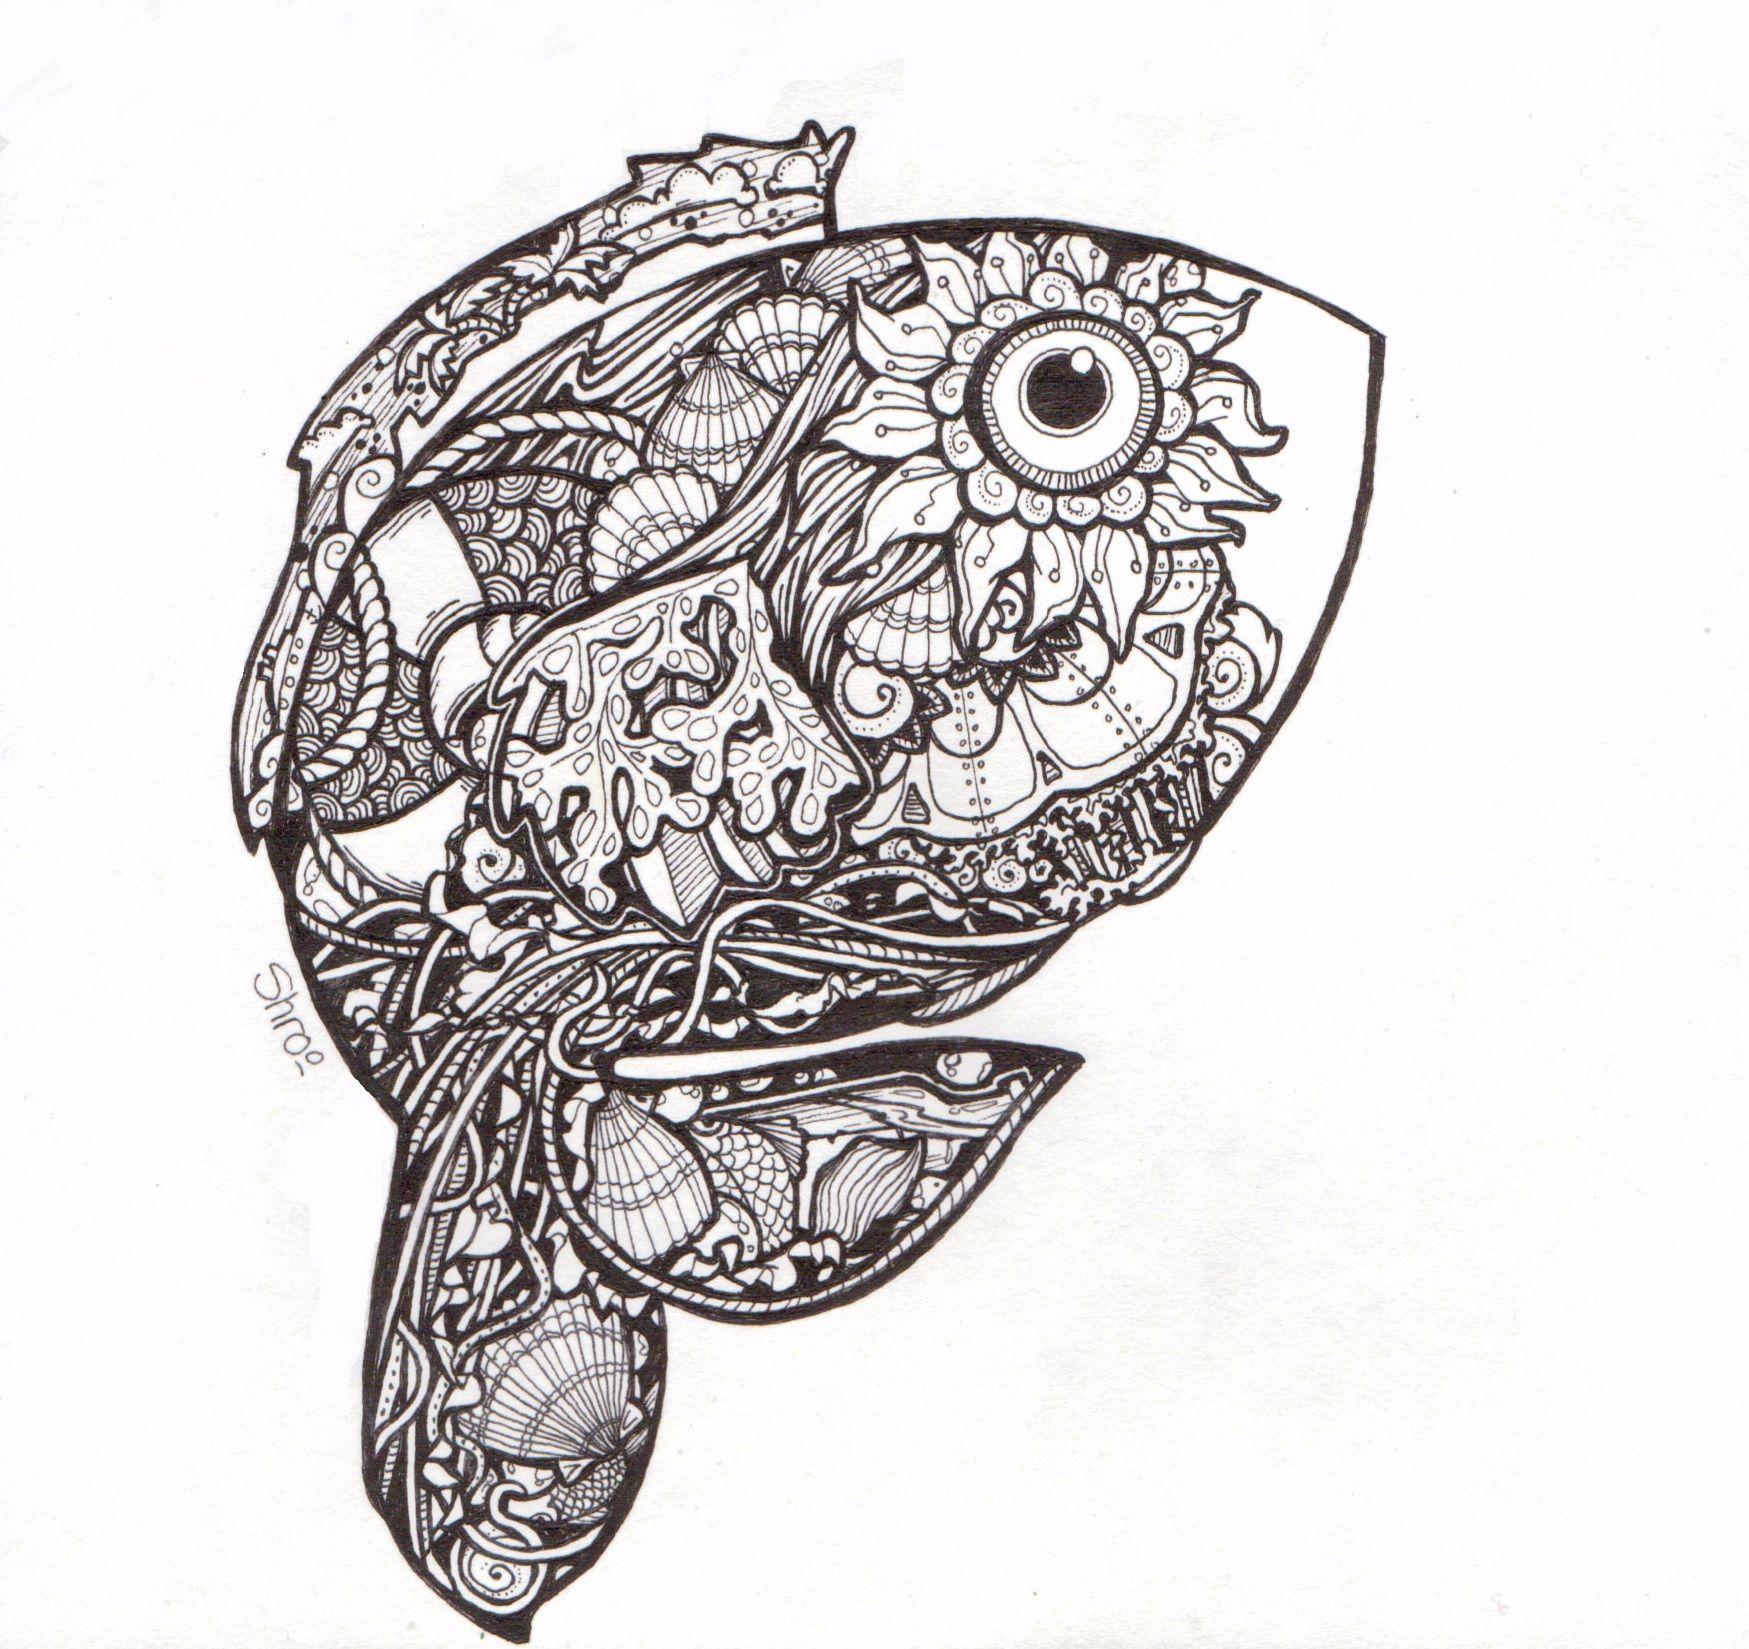 Felix murillo lleno de colores painting acrylic artwork fish art - Pen Ink Zentangle Ish Doodle Of A Fish In My Teeny Tiny Sketchbook